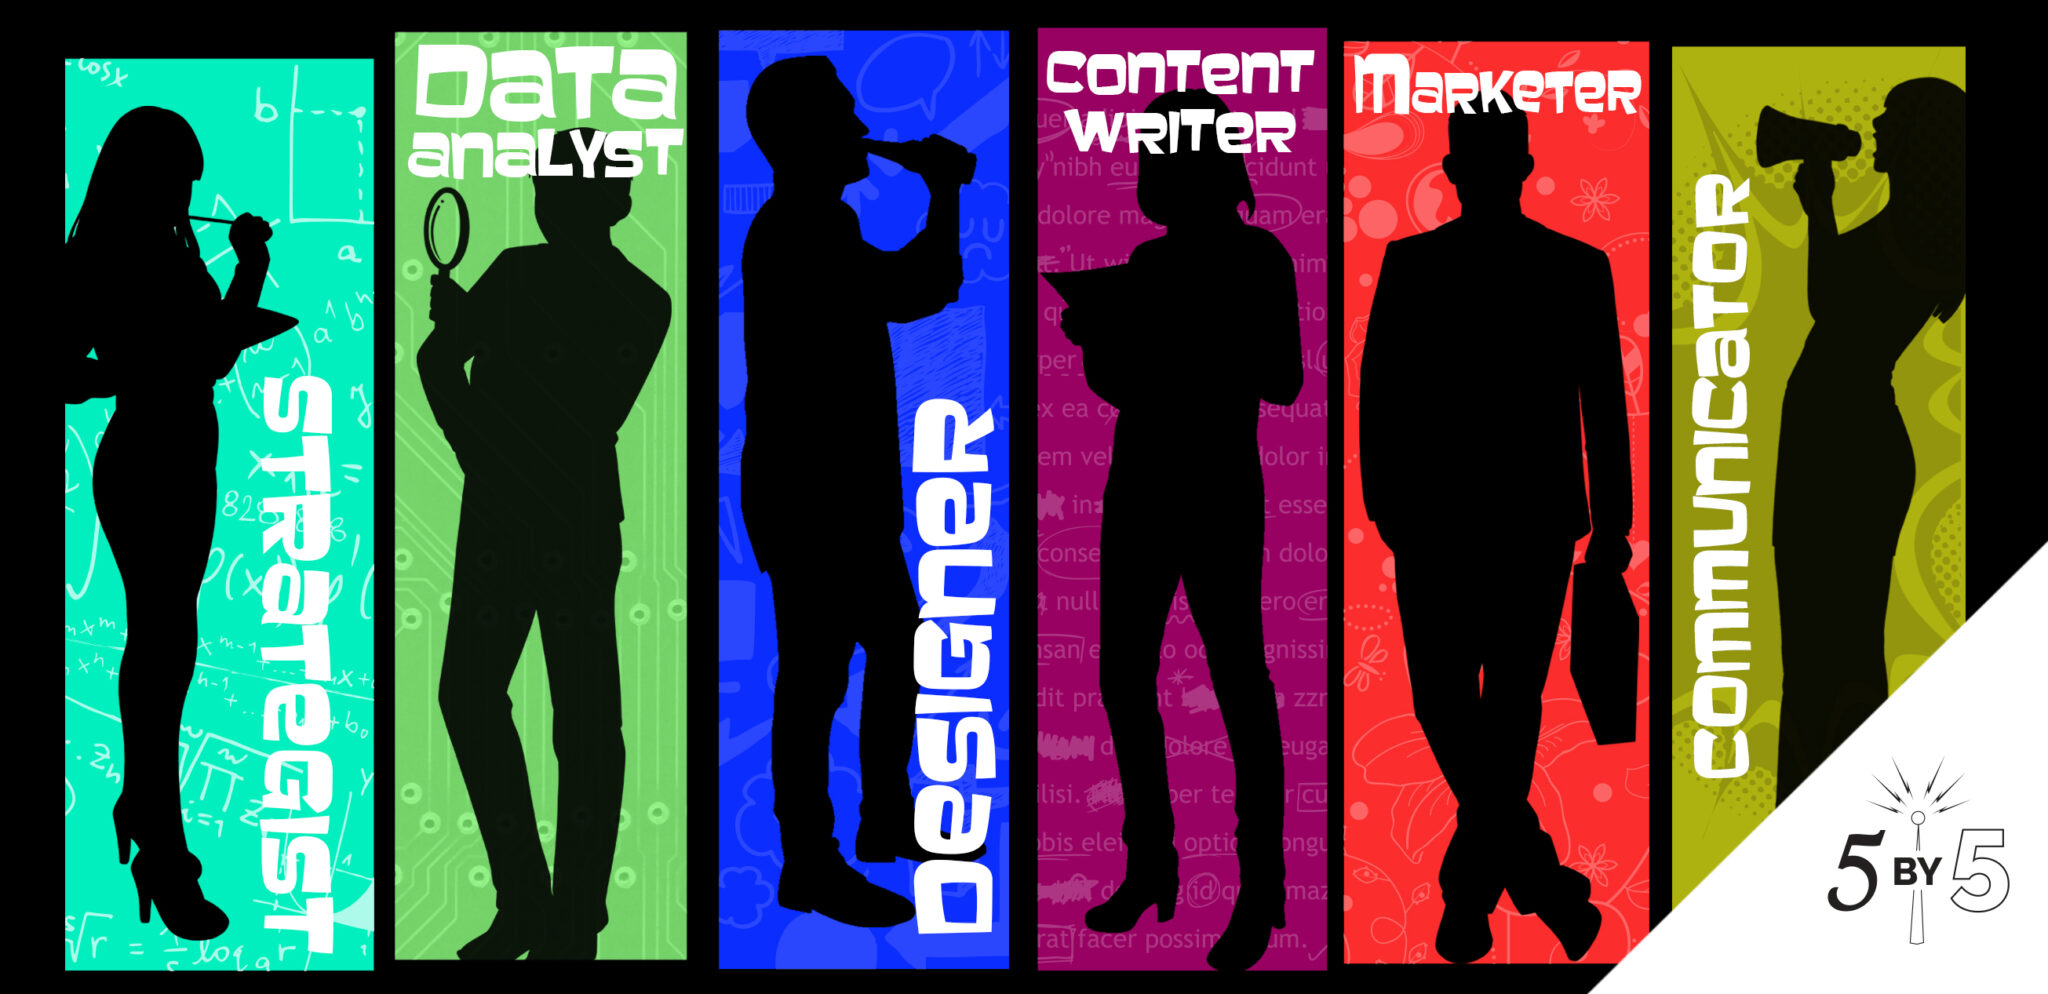 6 social media marketer profile images